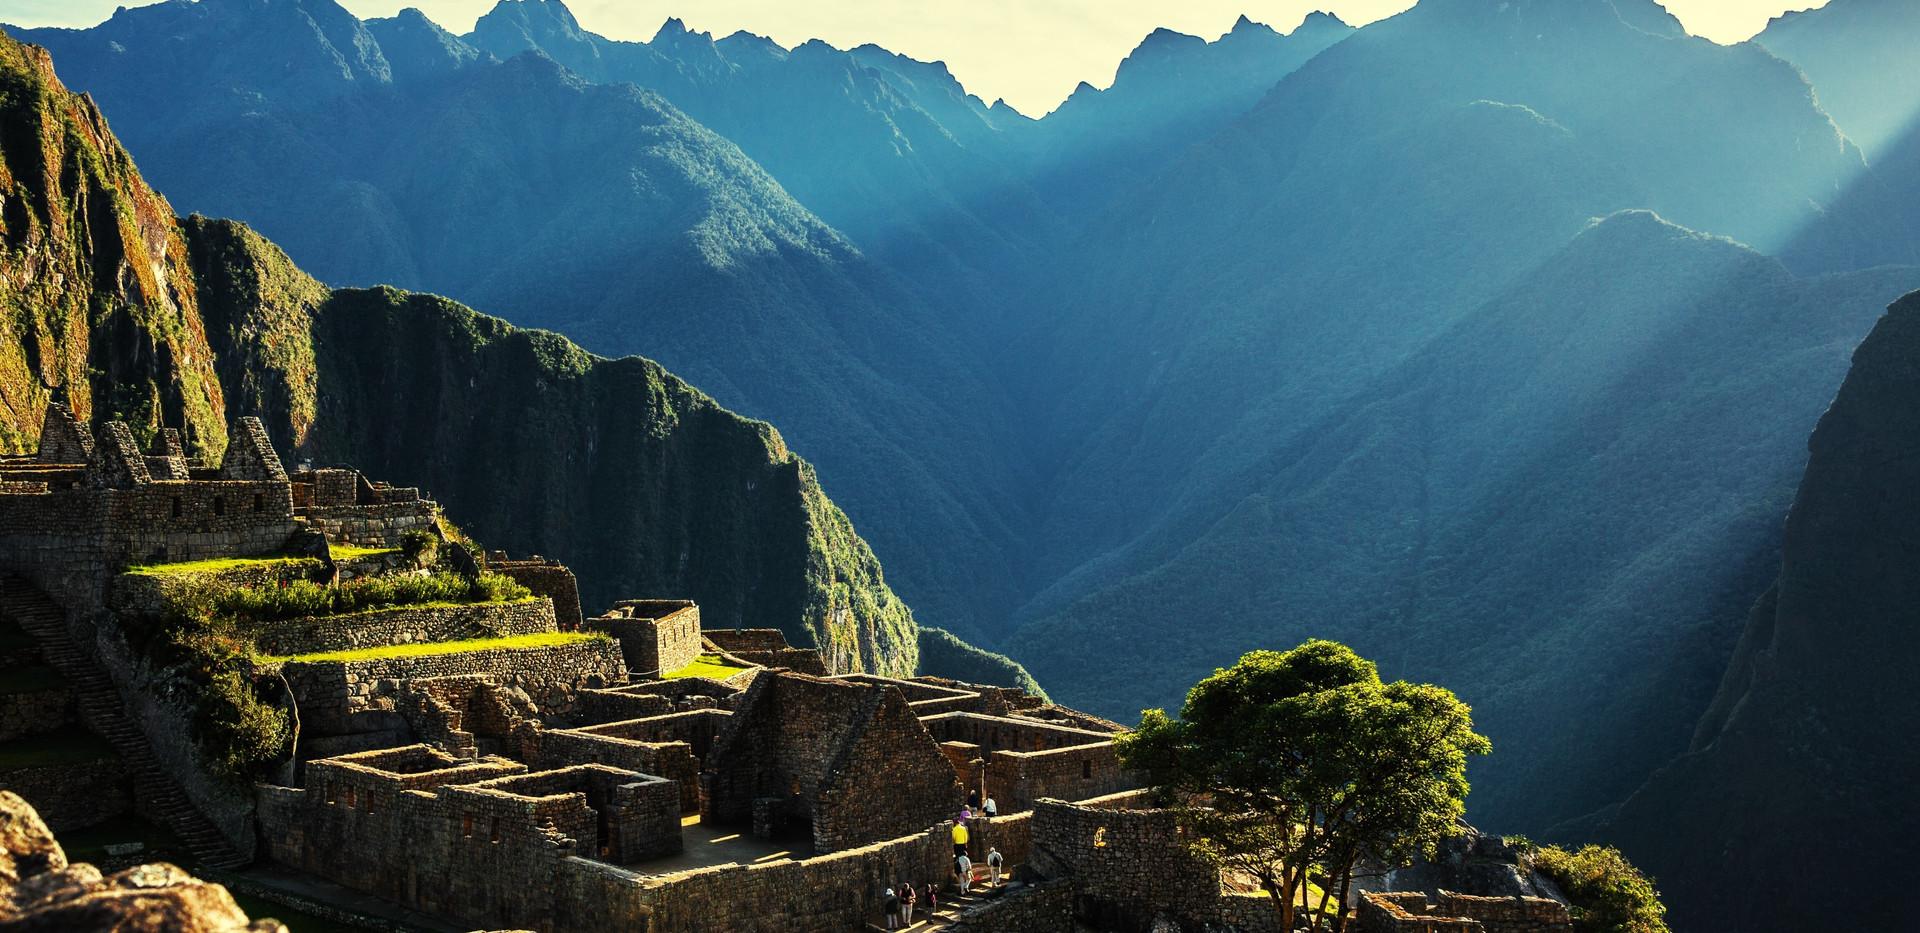 Machu Picchu Citadel